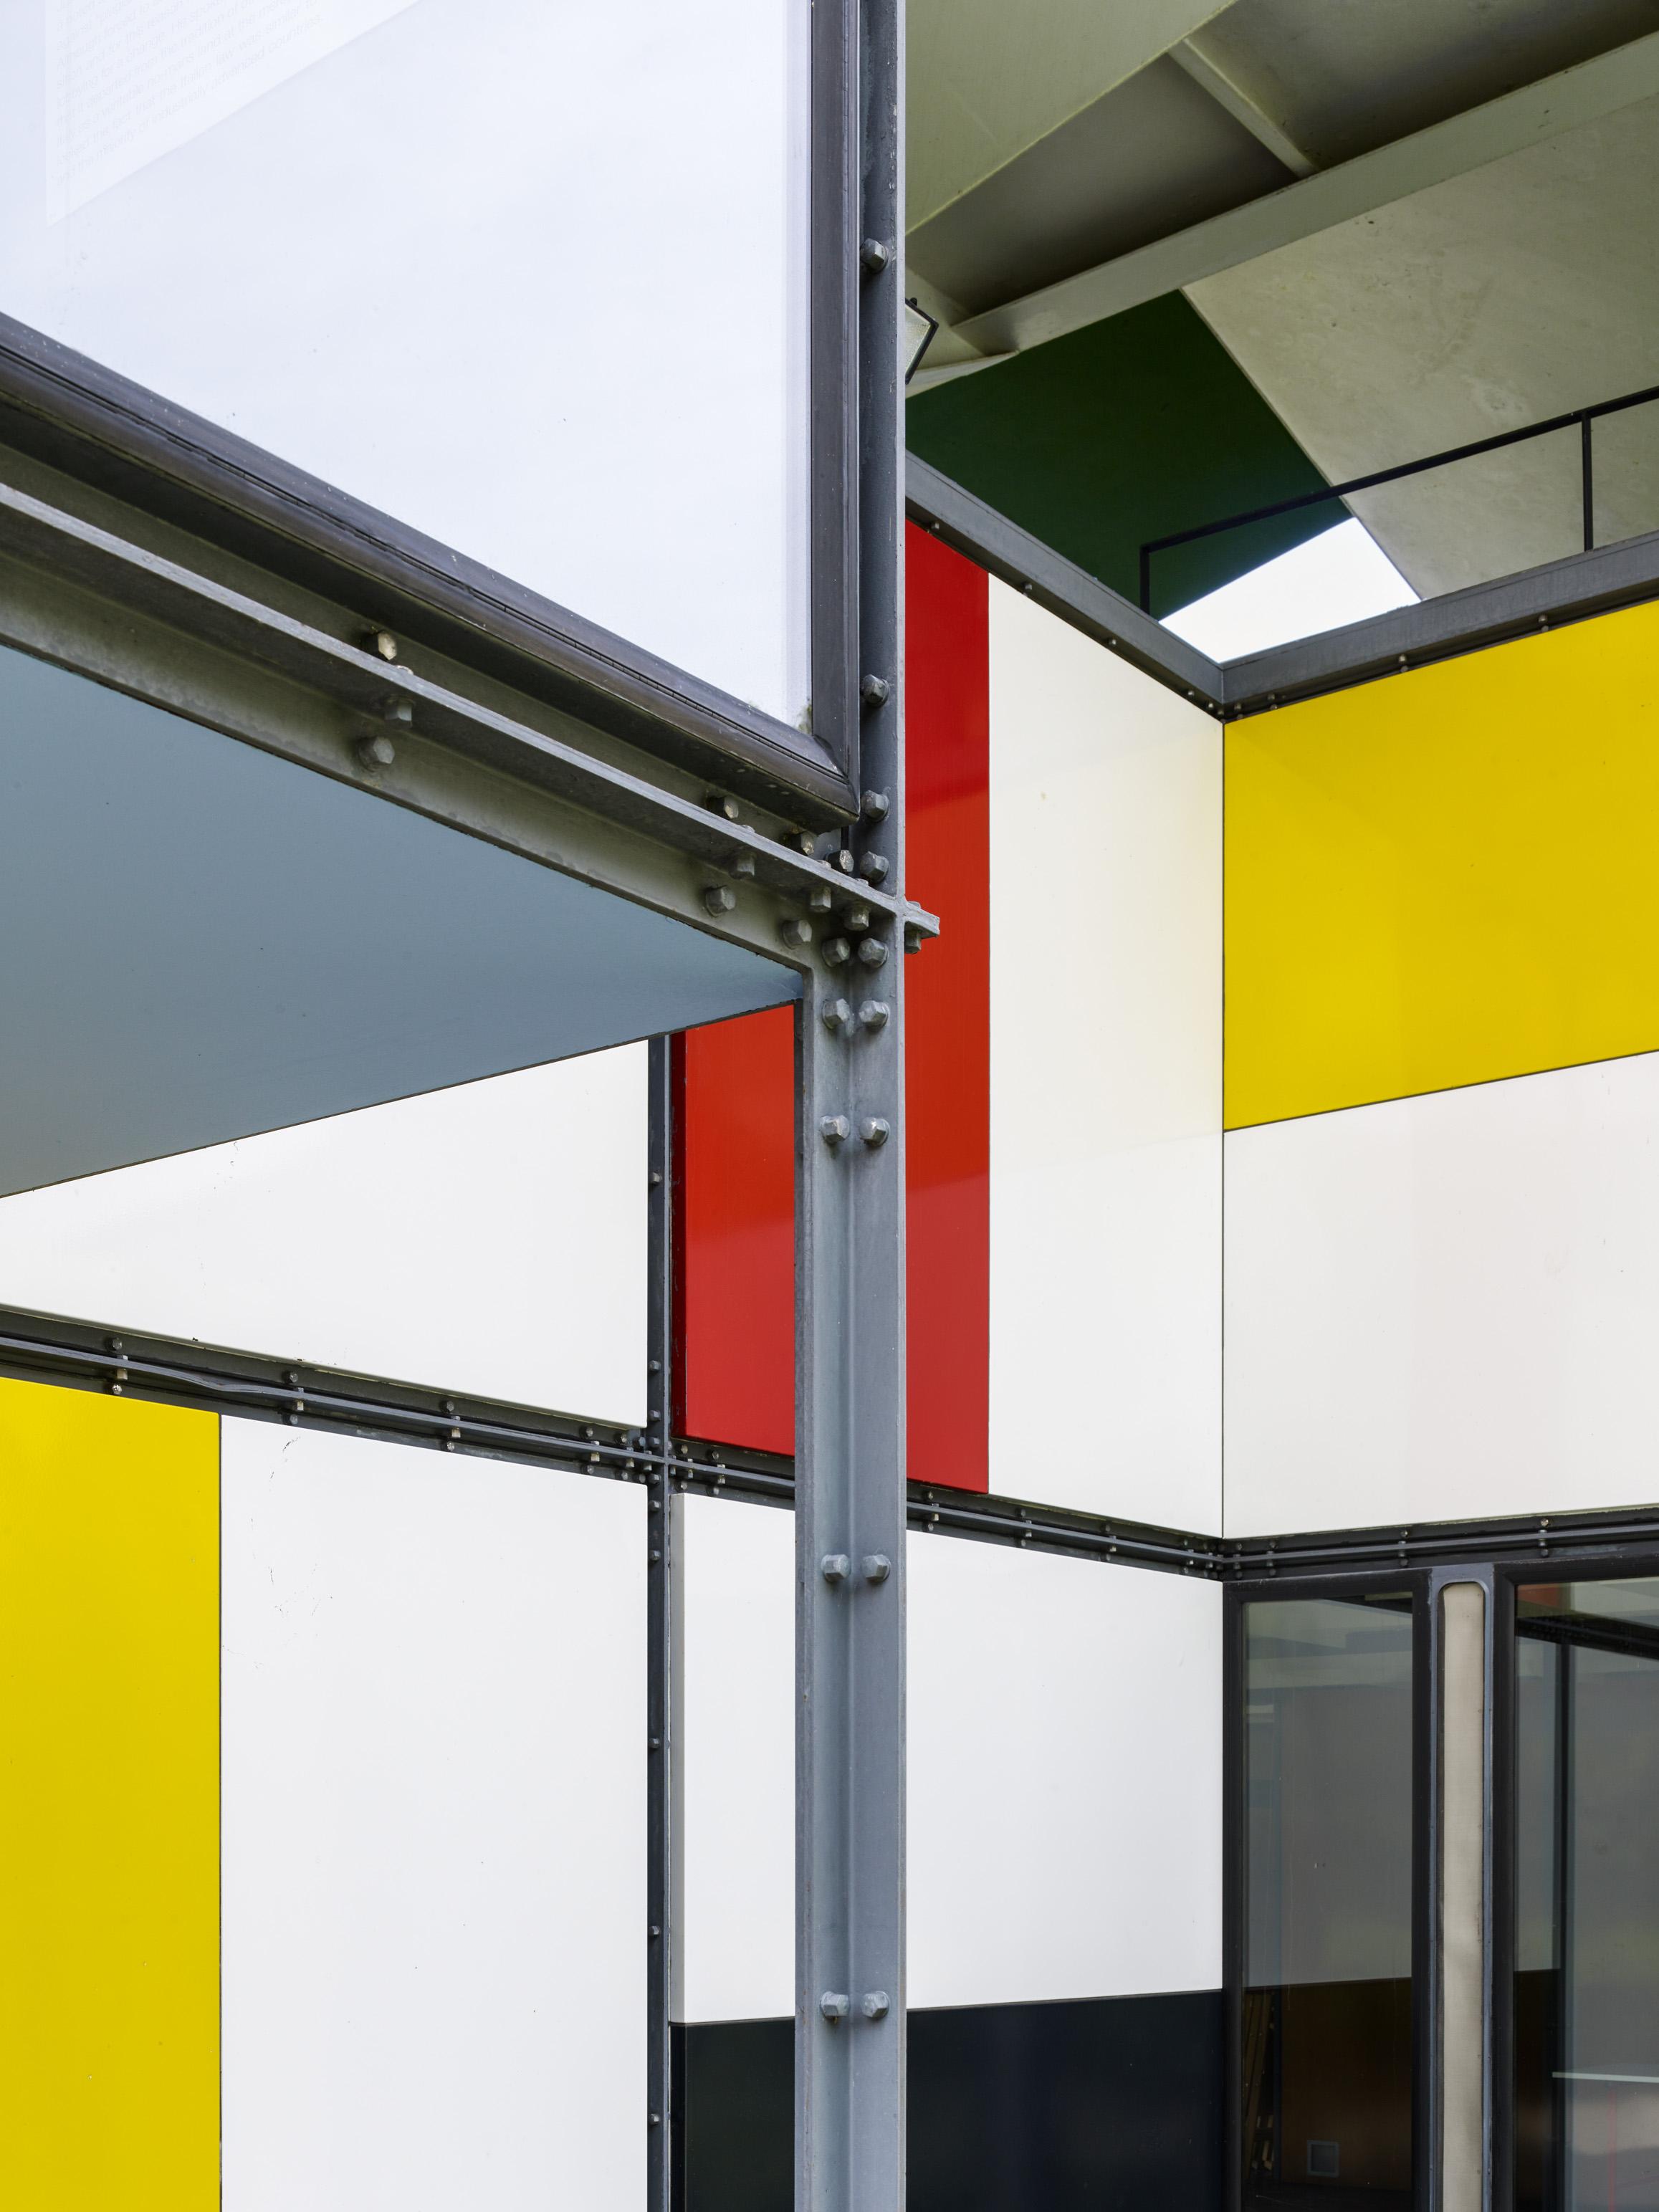 13_Pavillon Le Corbusier.jpg